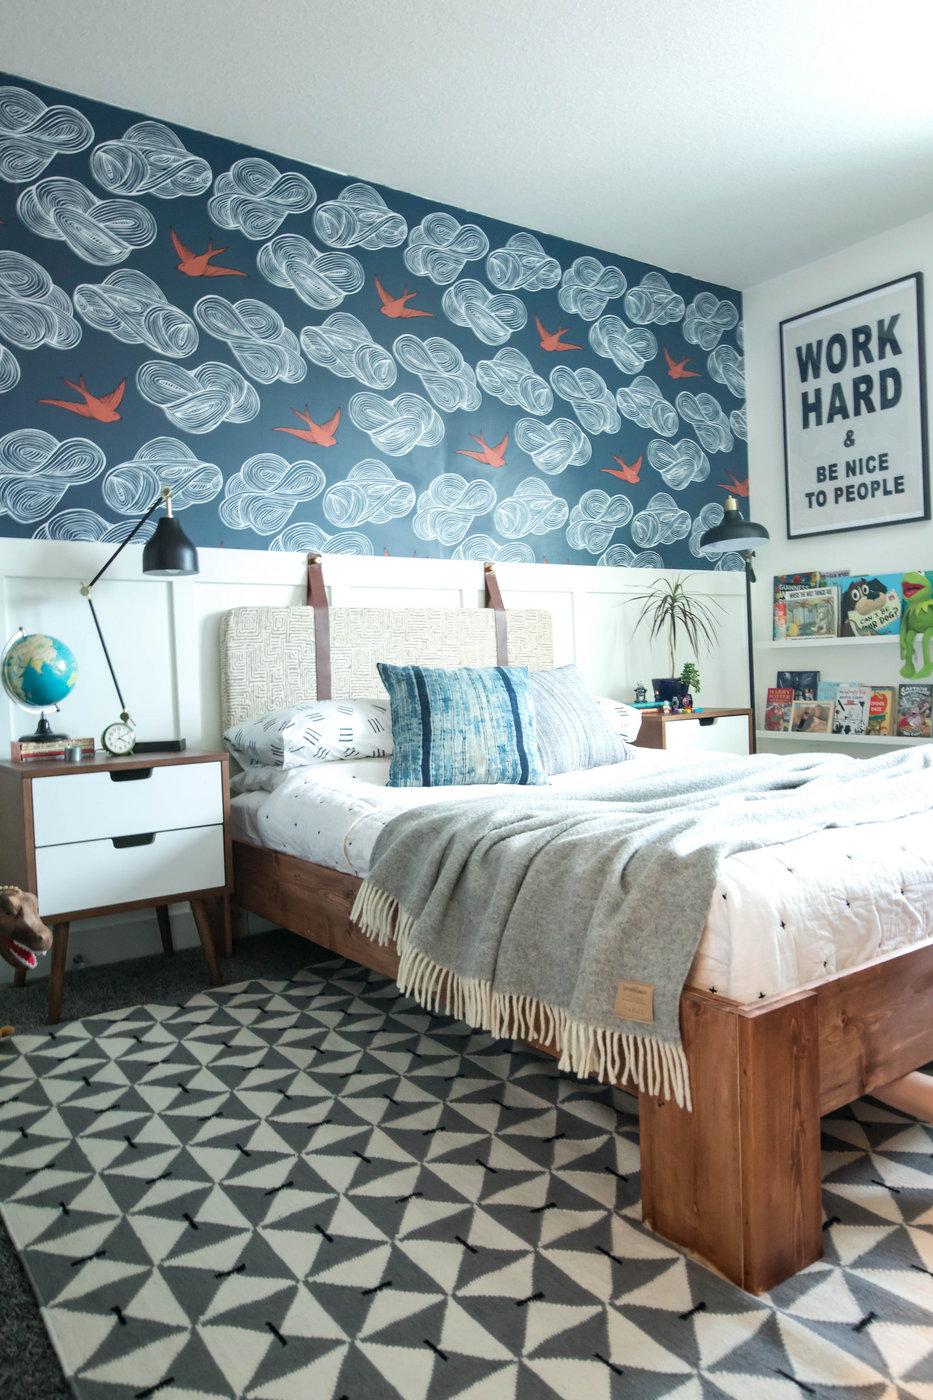 DIY, Kids room, boys room, Crave interiors, Kids Room Decor